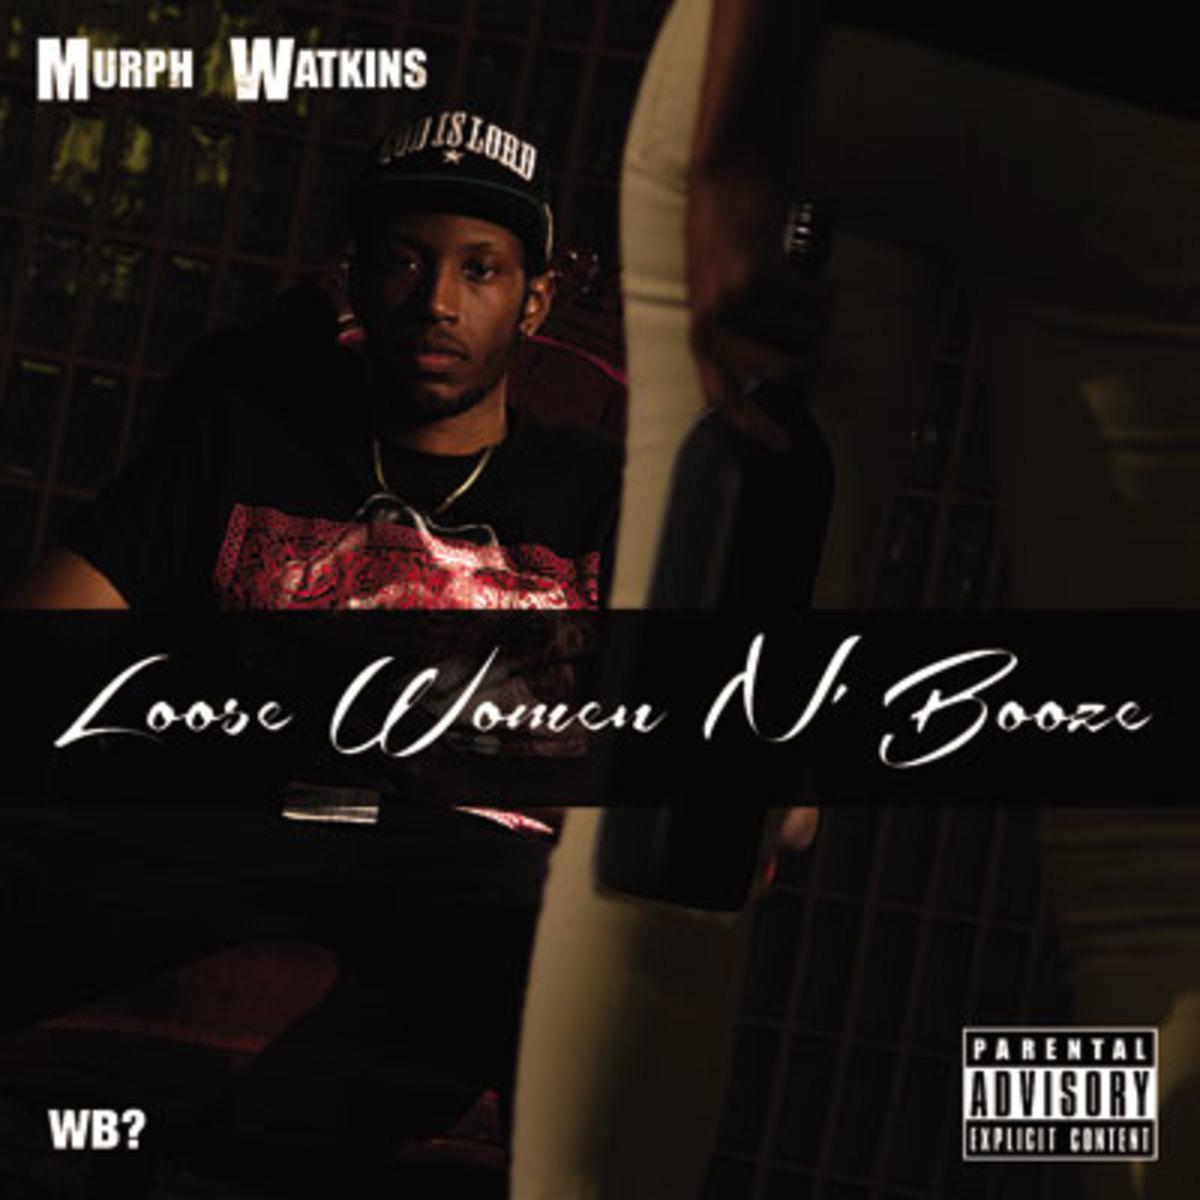 murphwatkins-loosewomenbooze.jpg